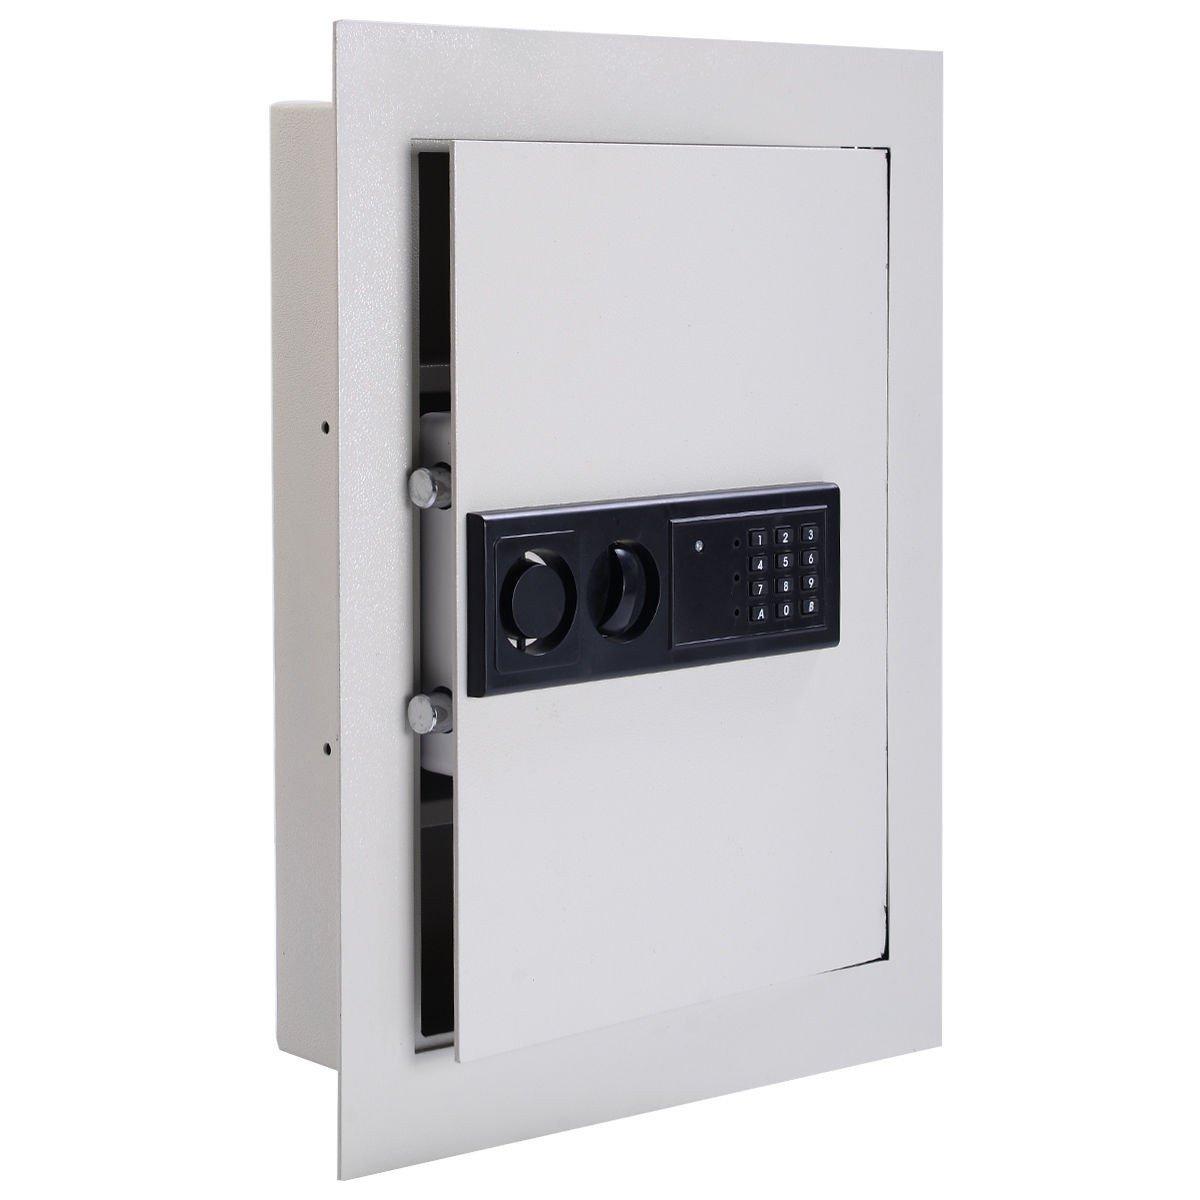 Digital Flat Recessed Wall Safe Security Safe